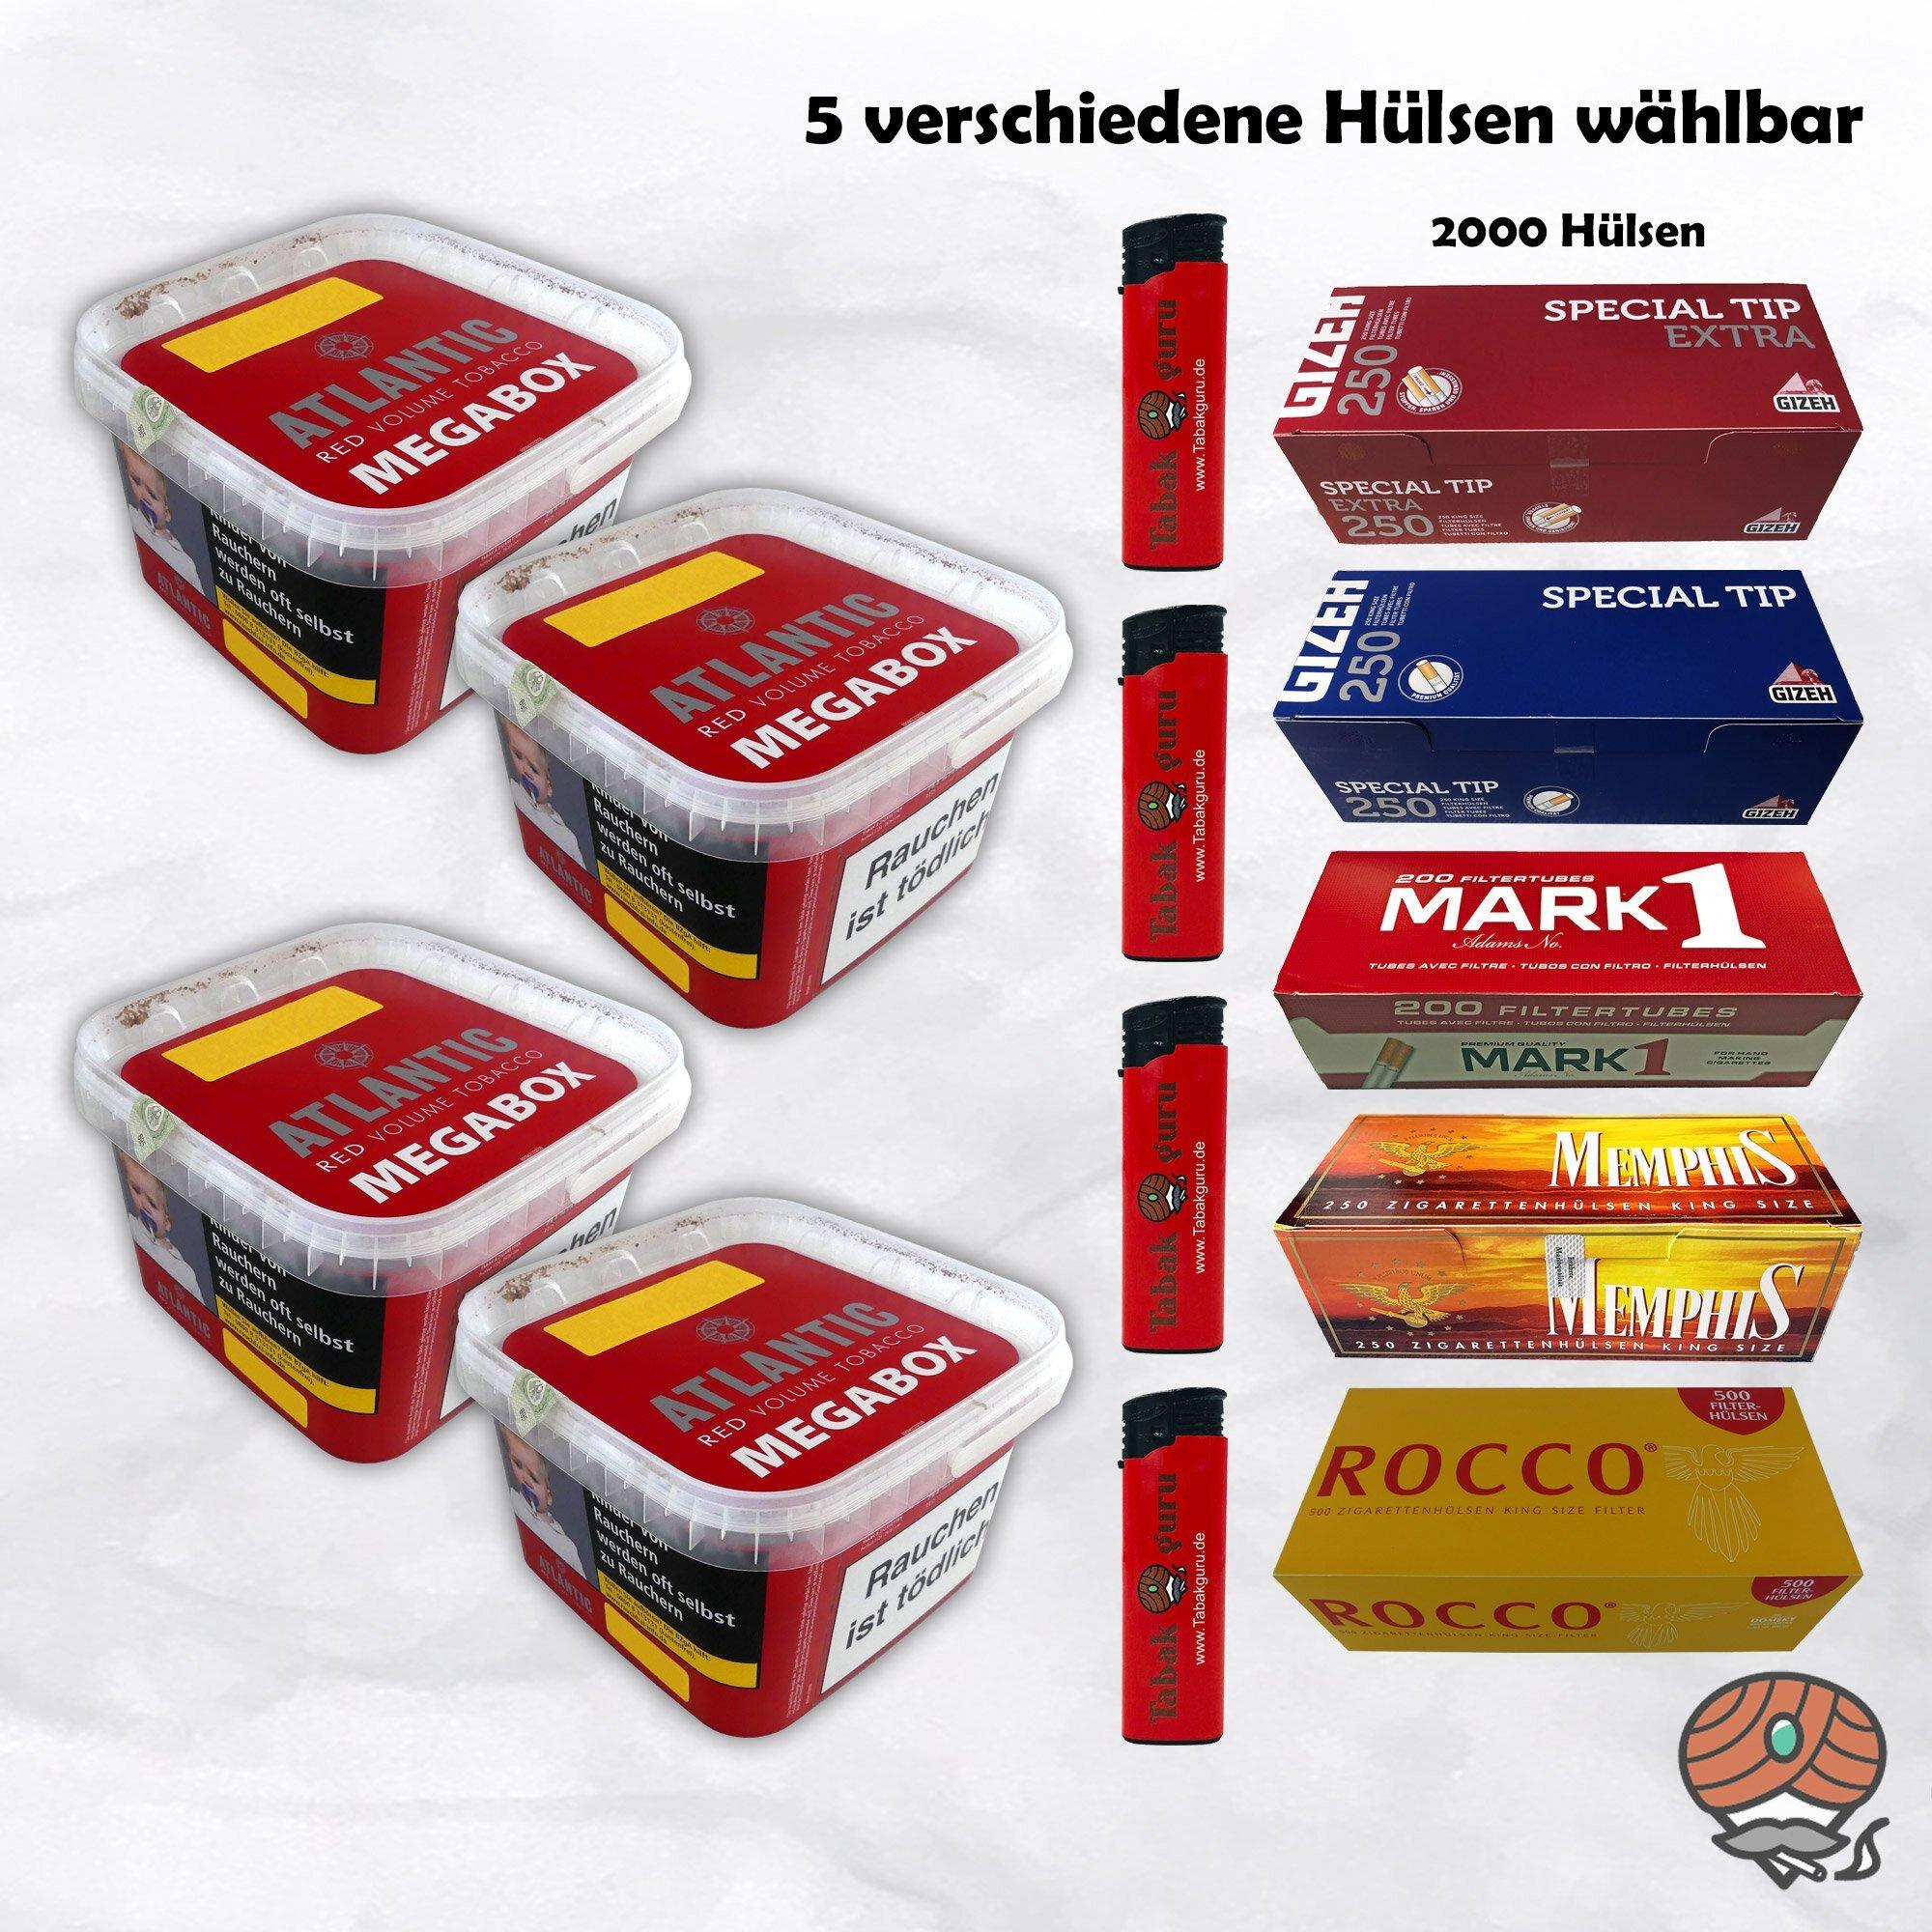 4 x ATLANTIC Red Volumentabak Megabox 200 g + 2.000 Hülsen wählbar - Angebot ohne Hülsen